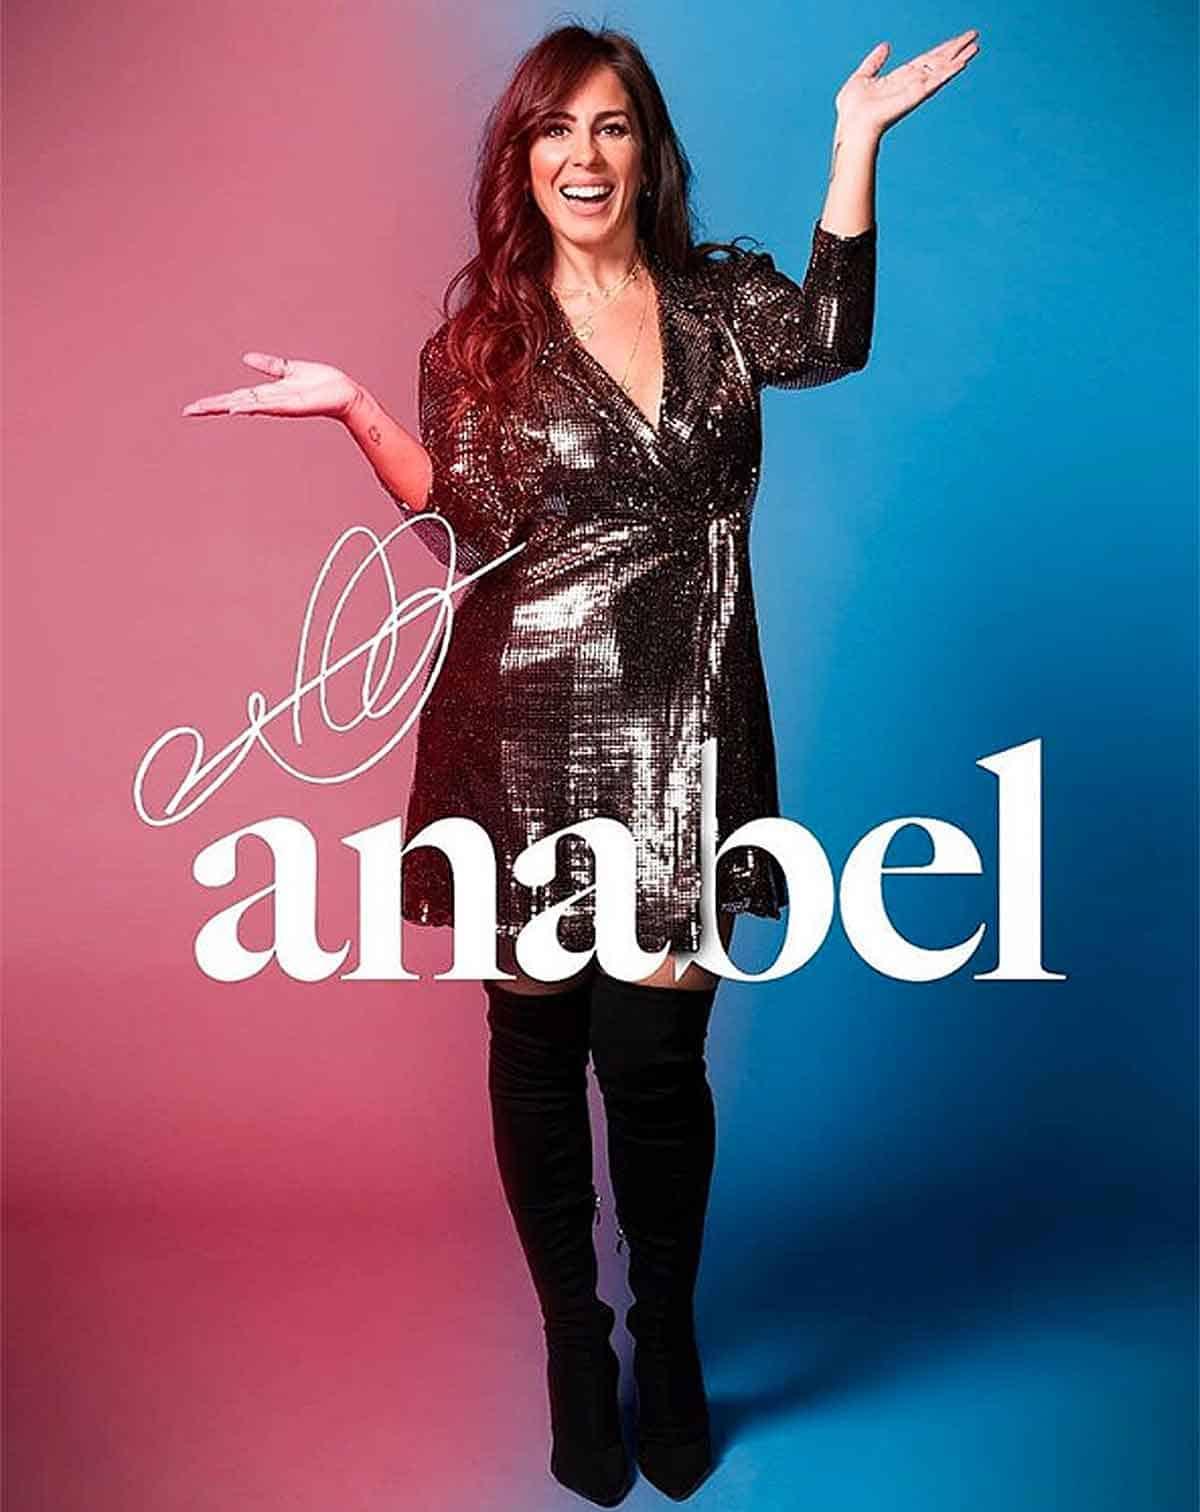 anabel pantoja 2